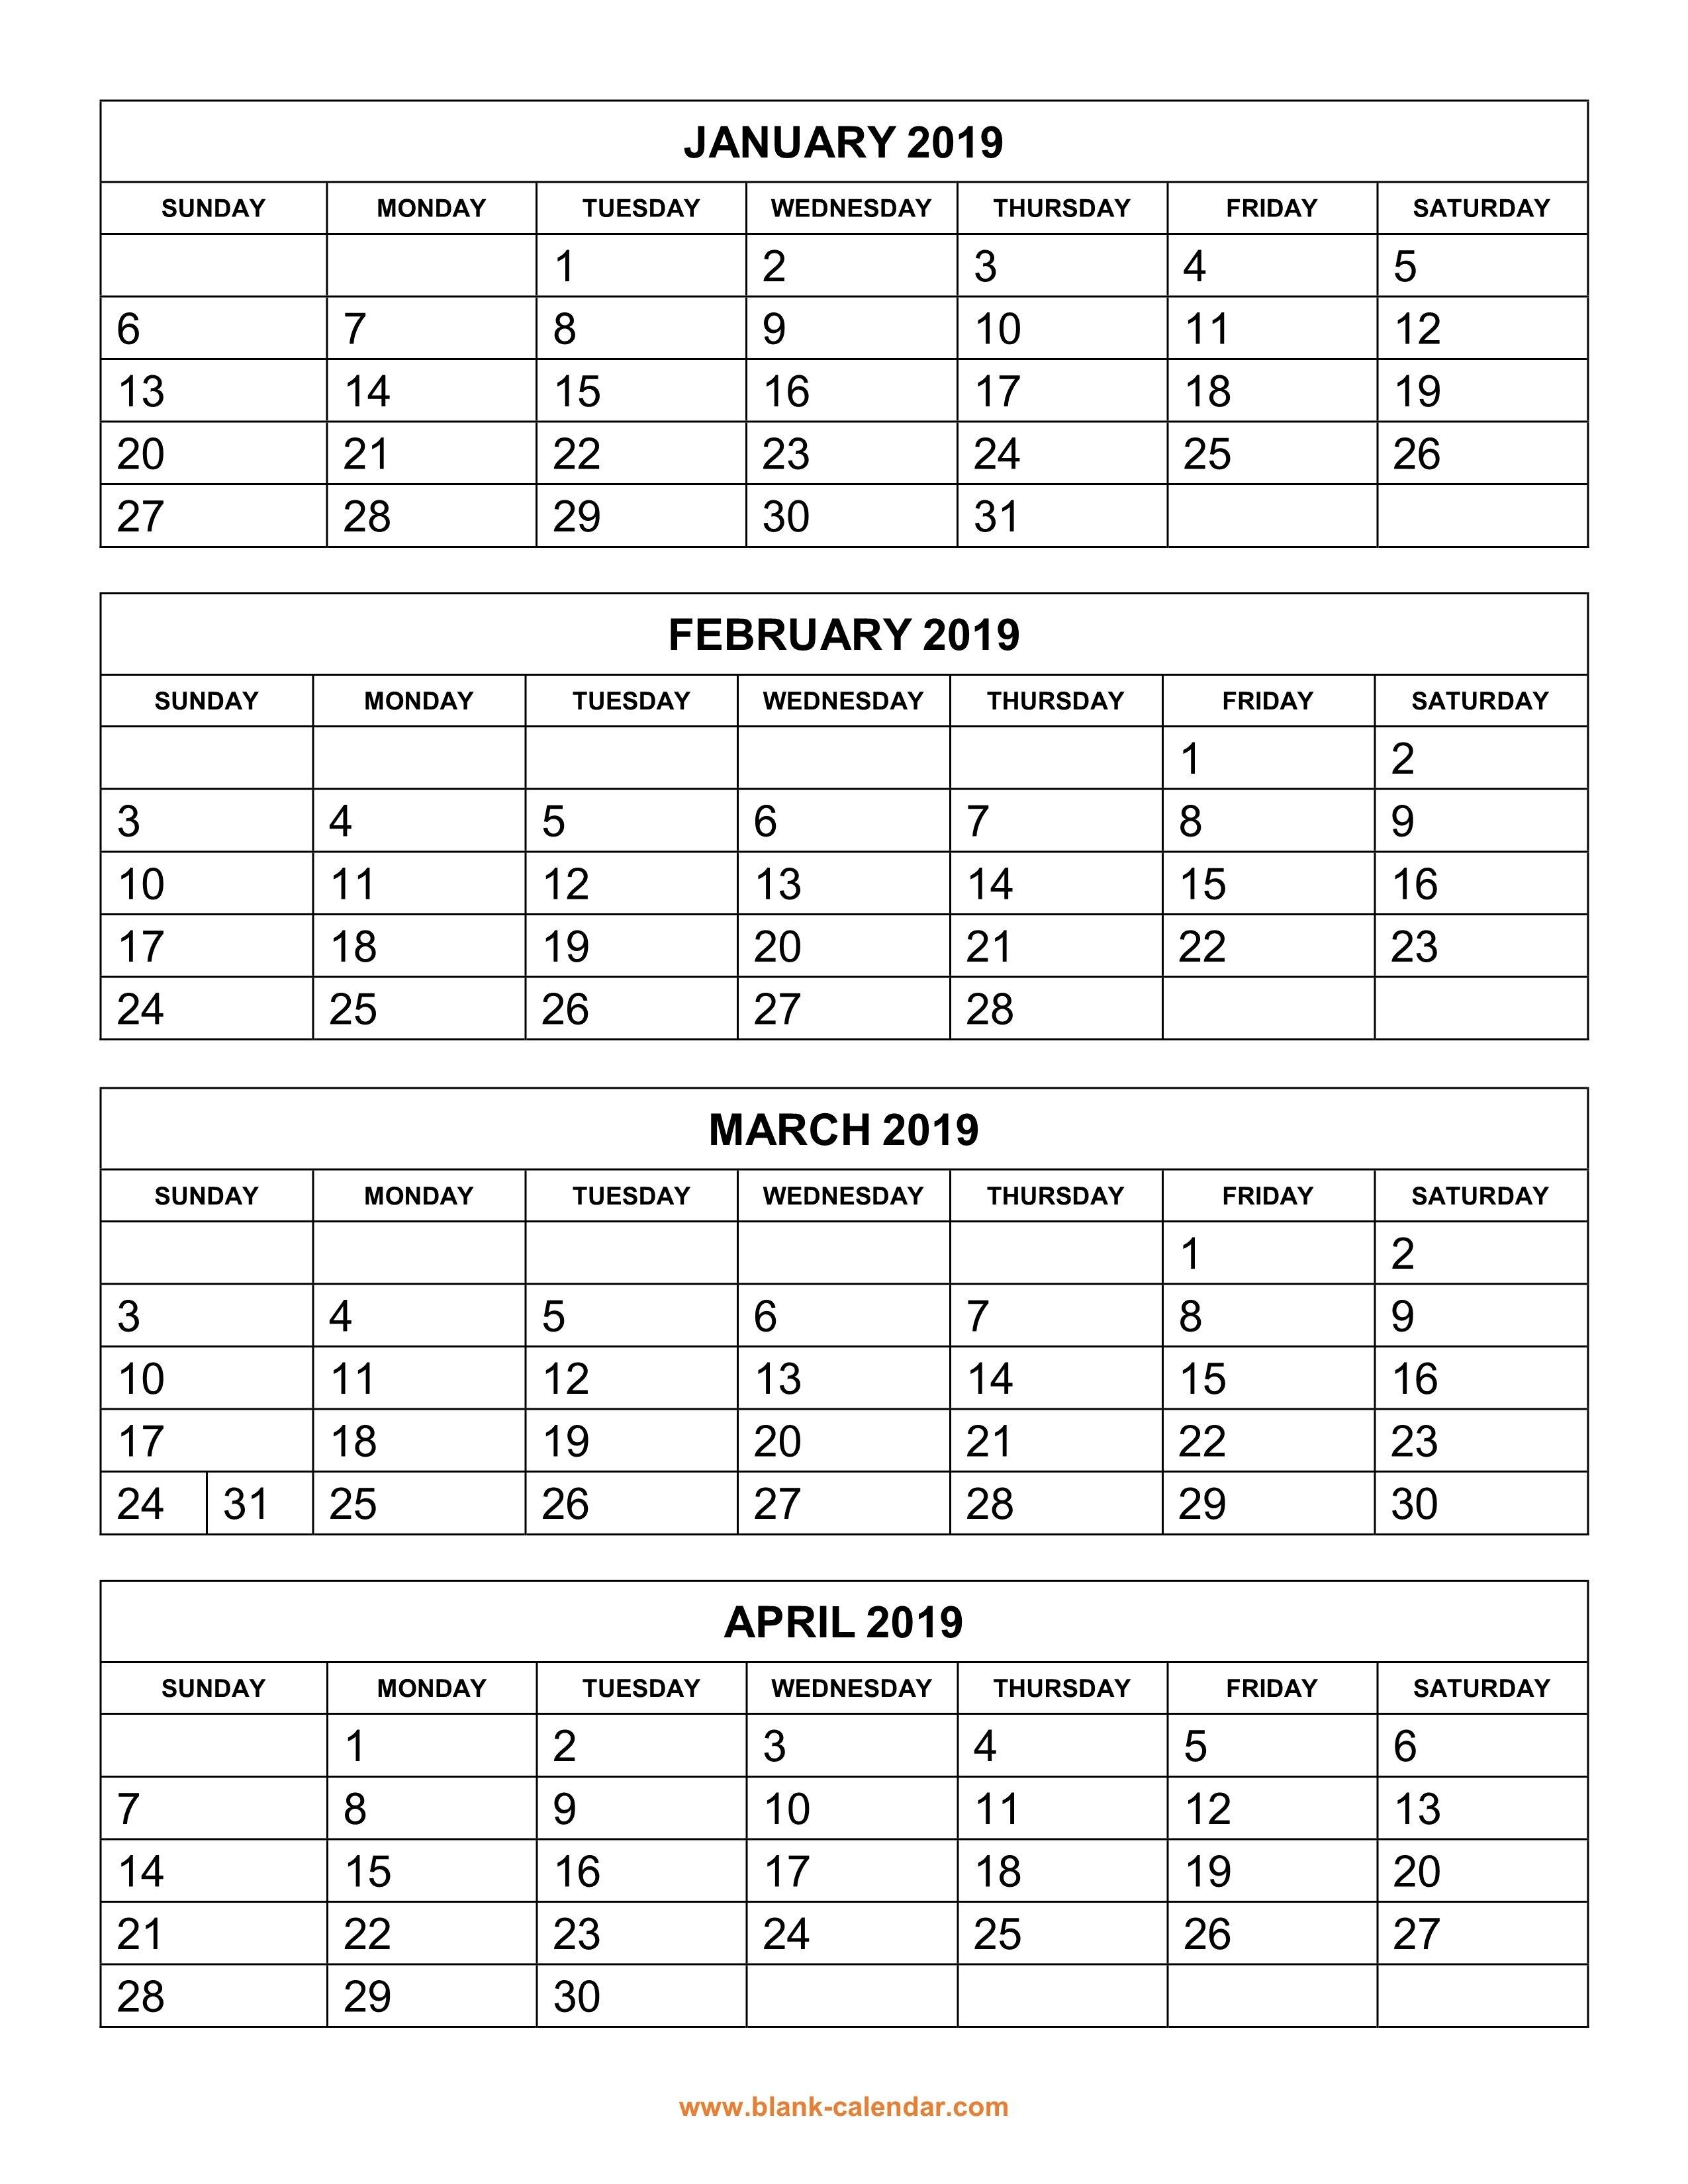 Free Download Printable Calendar 2019, 4 Months Per Page, 3 Pages Calendar 2019 3 Months Per Page